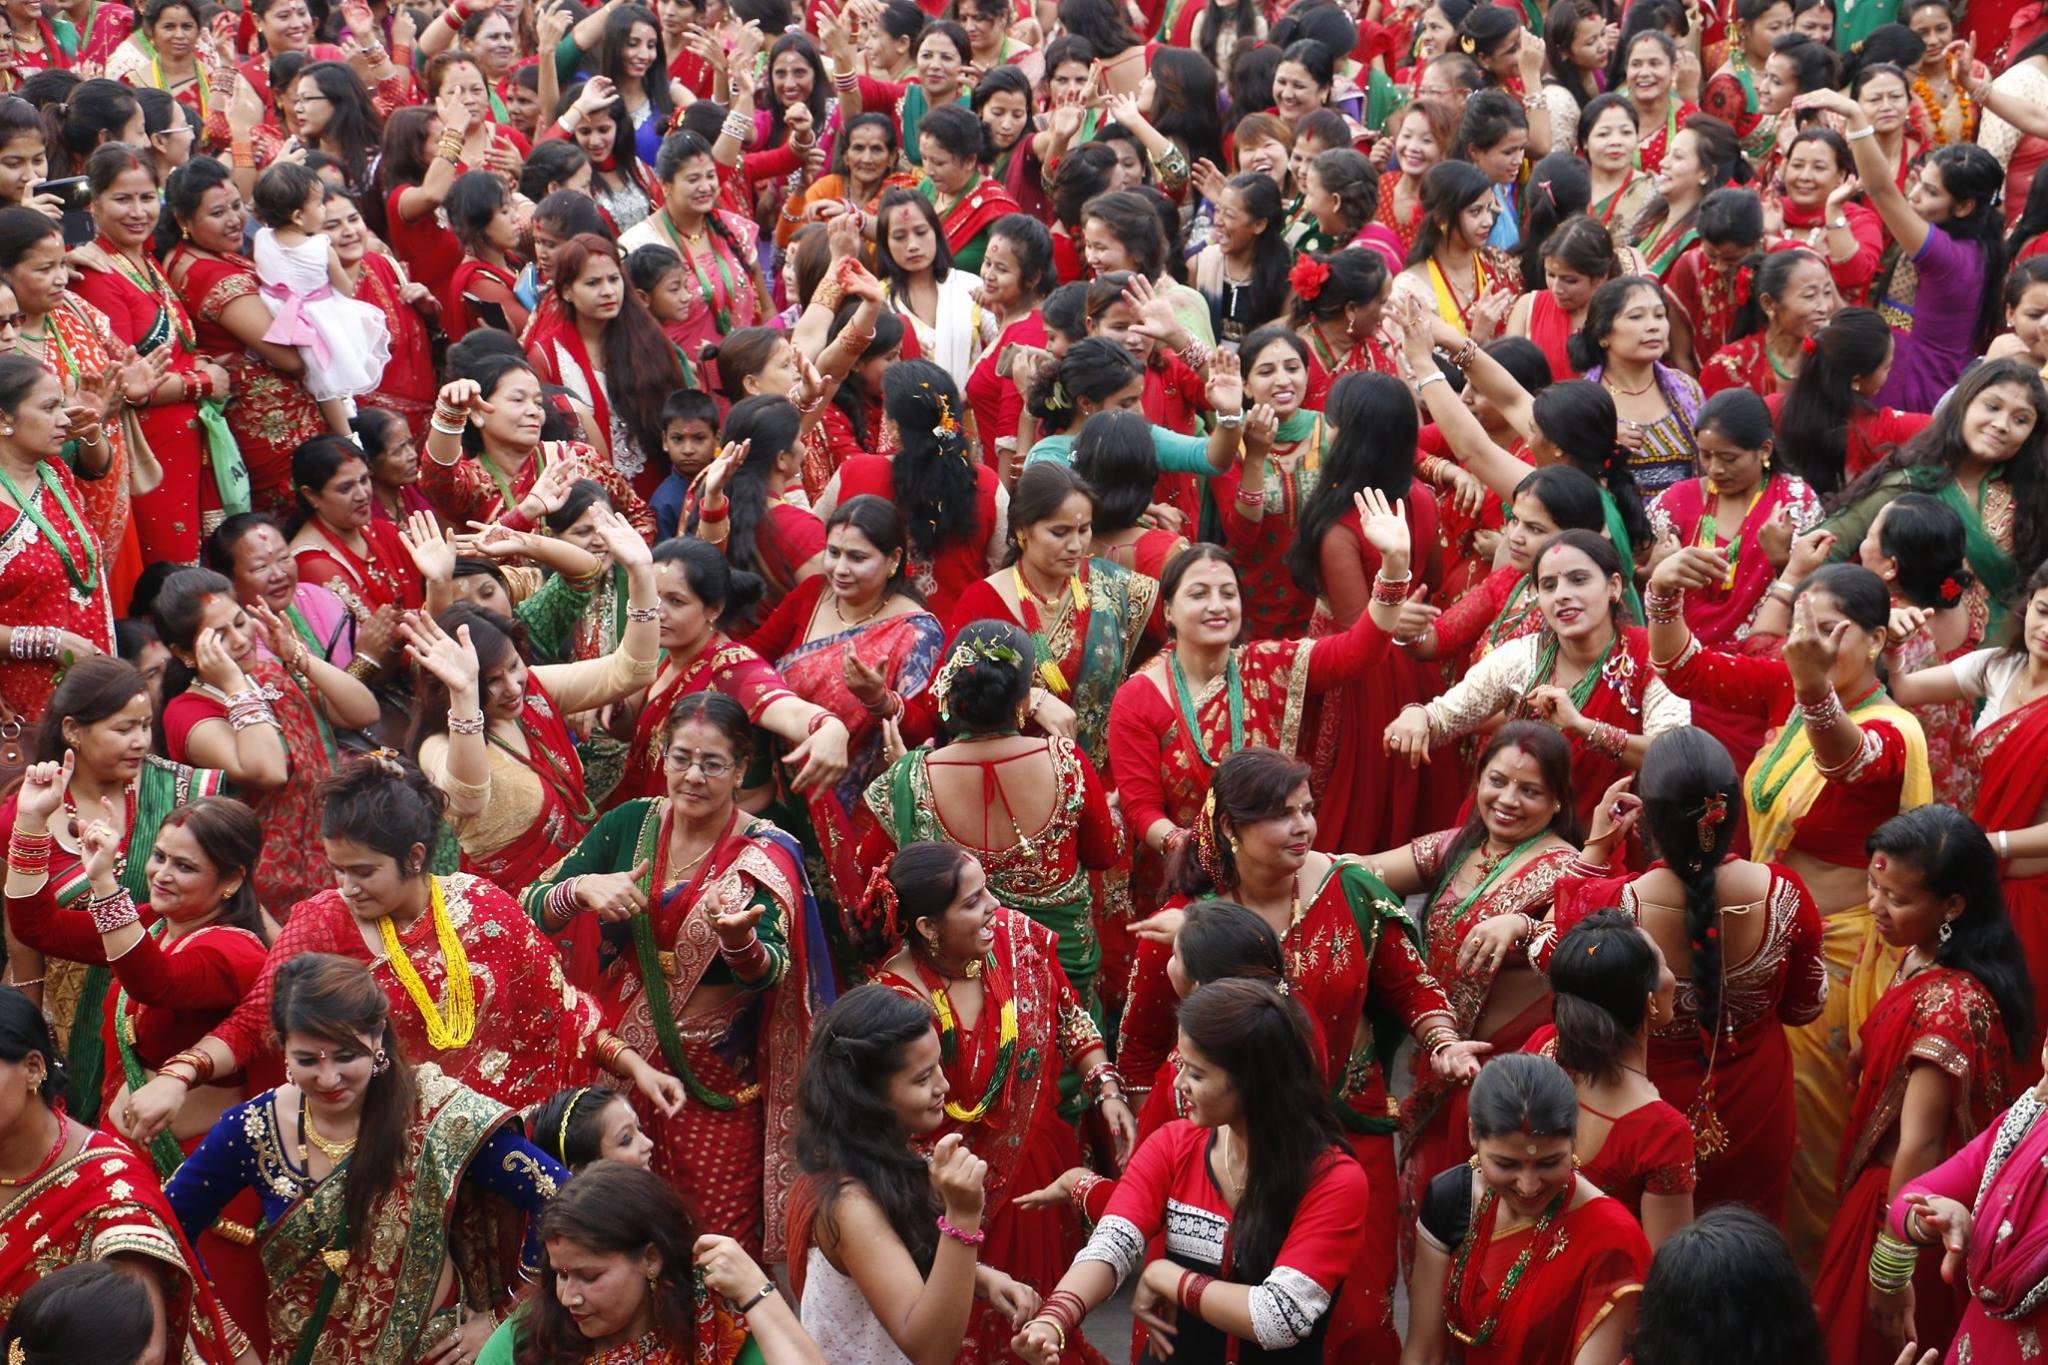 Women dancing and celebrating in Teej festival. Photo courtesy of Kapil Thapa